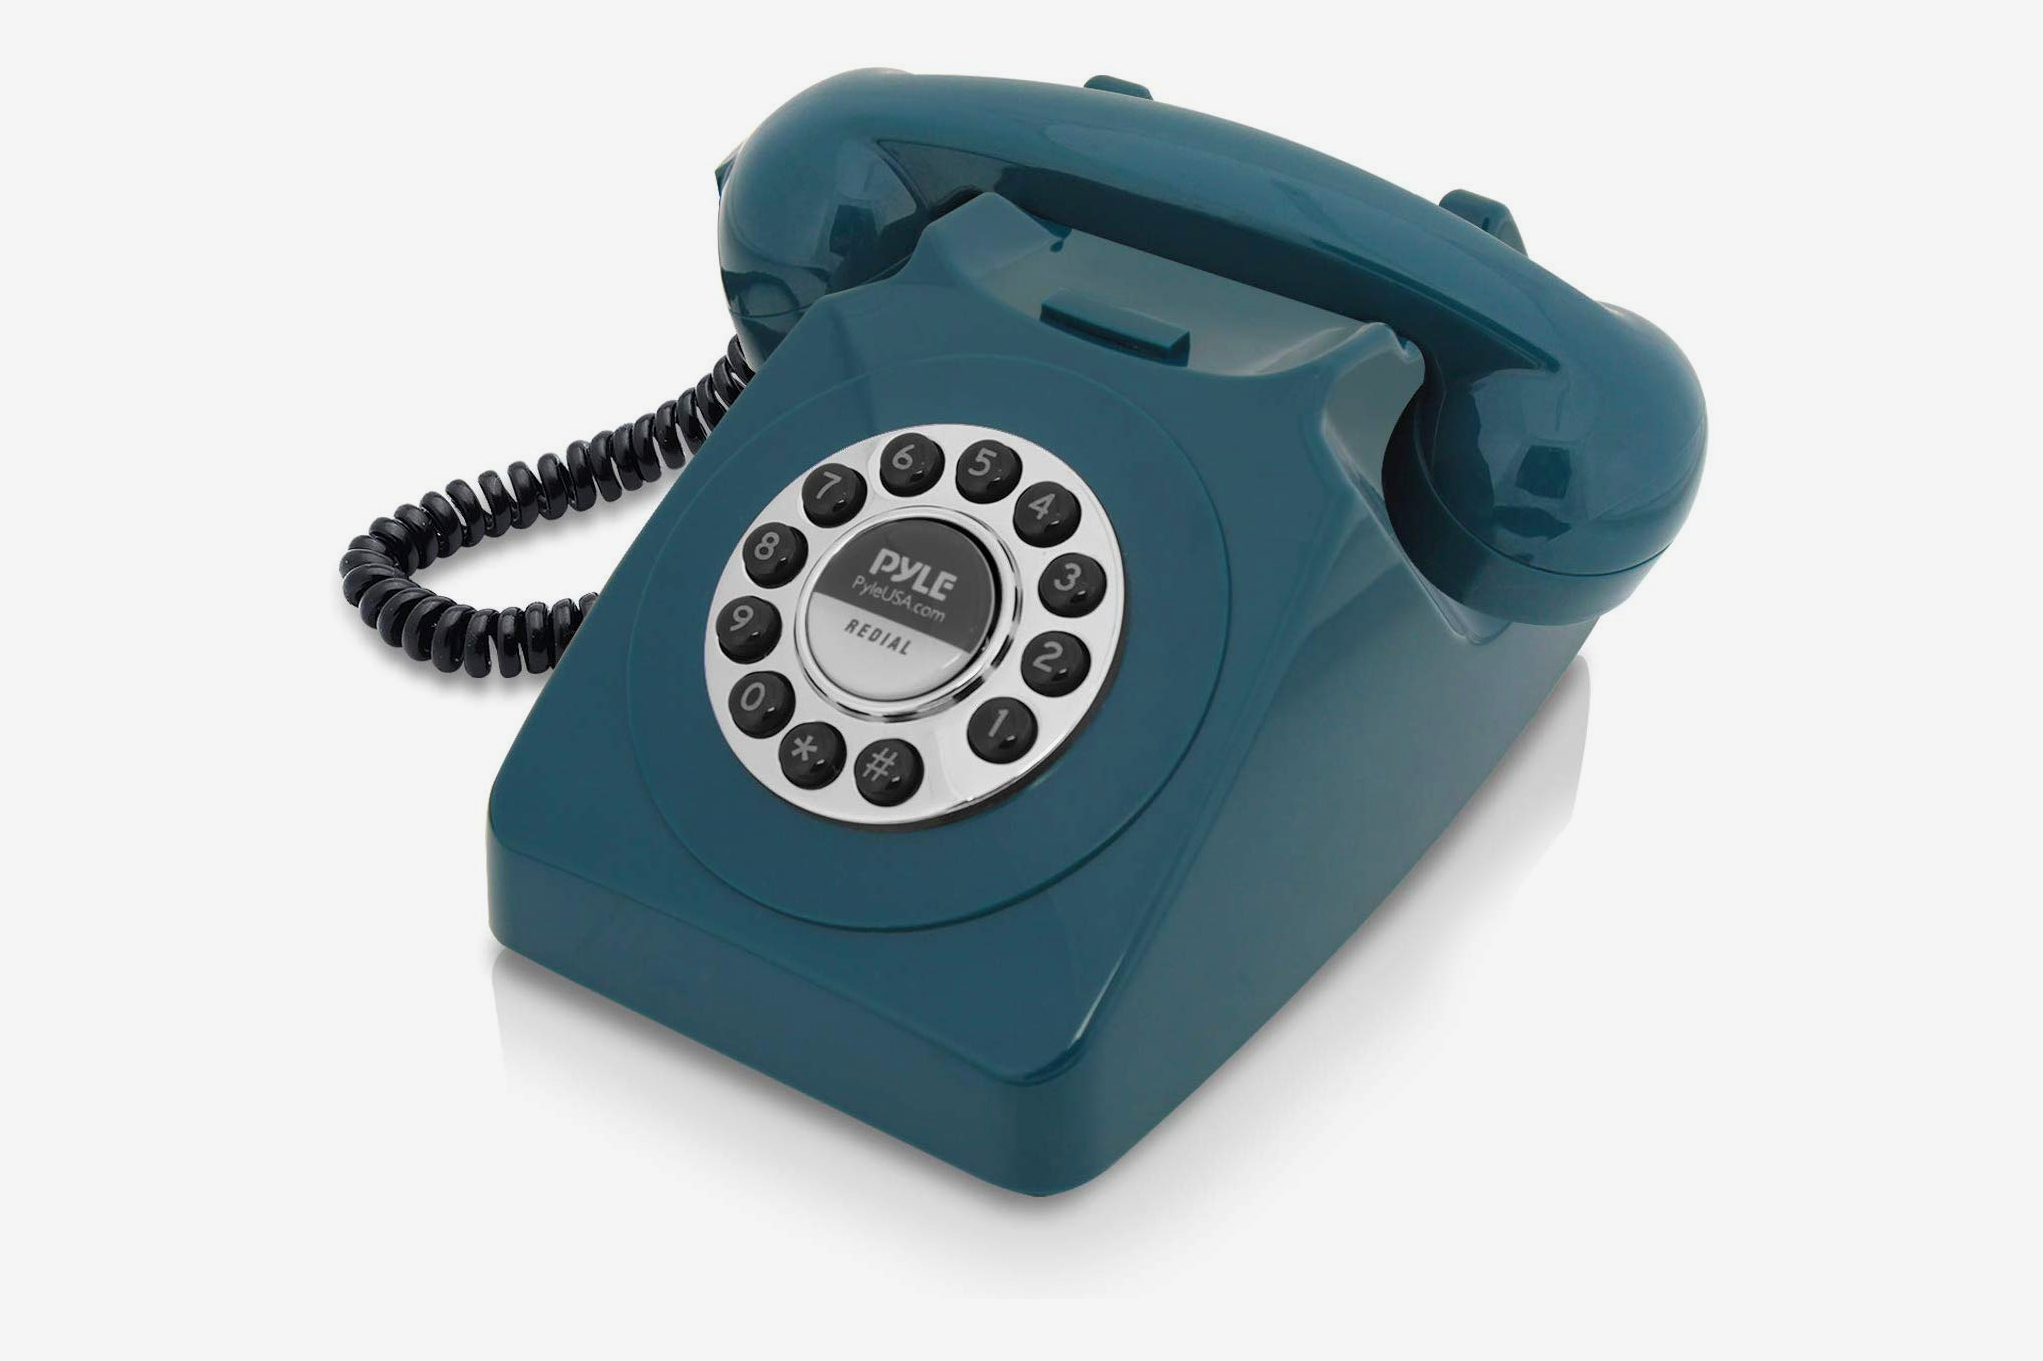 Retro Design Corded Landline Phone